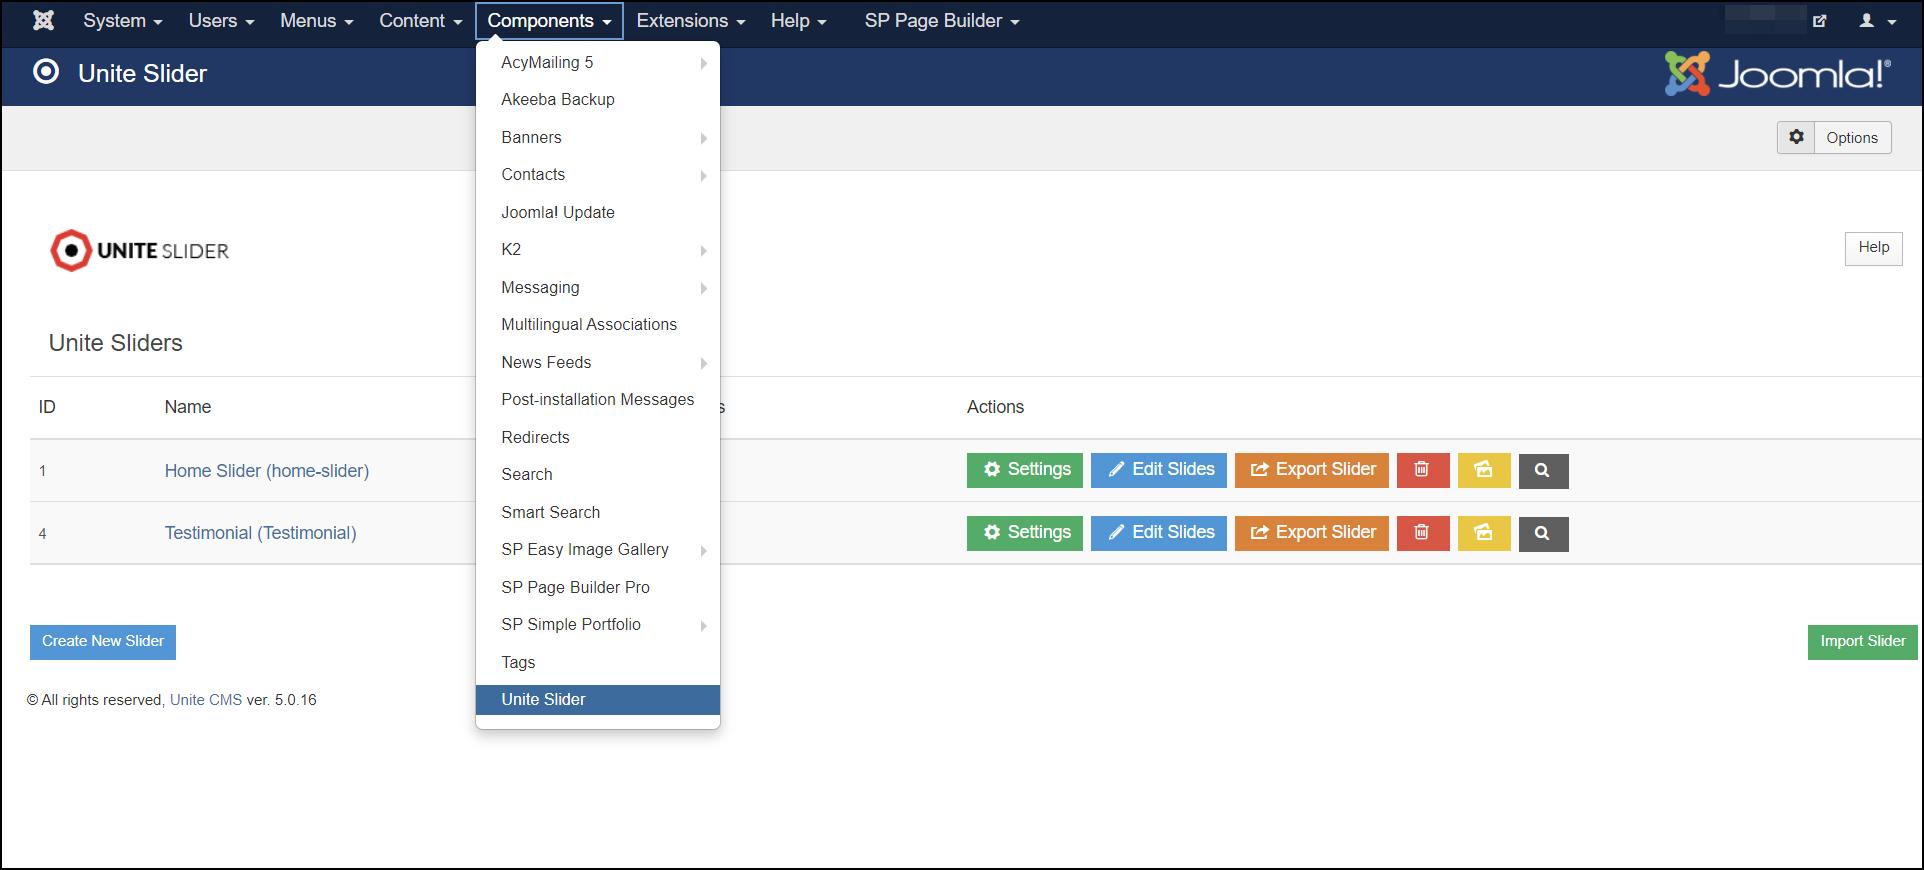 Joomla 3 - Access Unite Slider